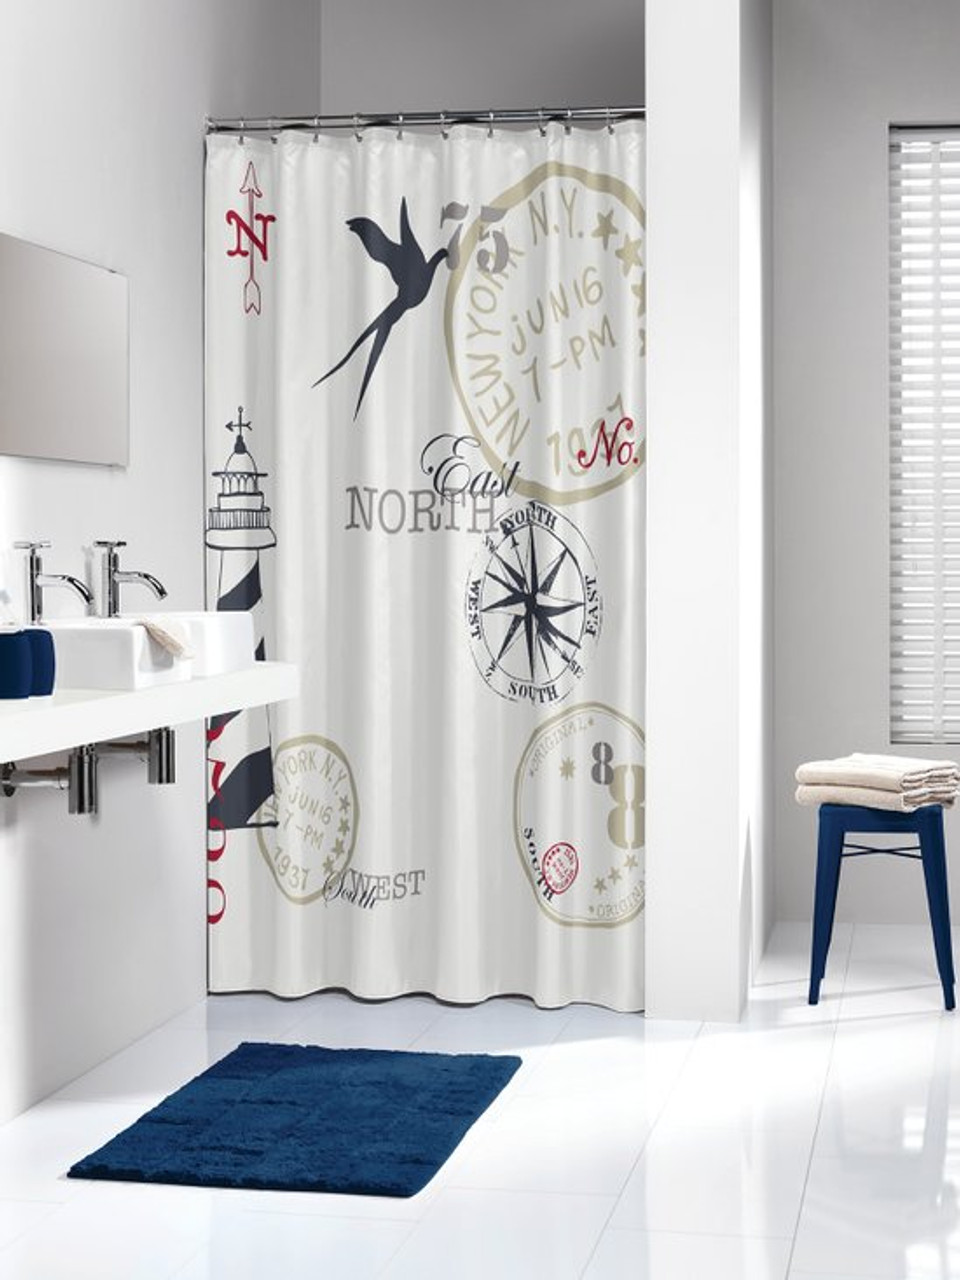 Extra Long Shower Curtain 72 x 78 Inch Sealskin Faro Nautic Print Fabric